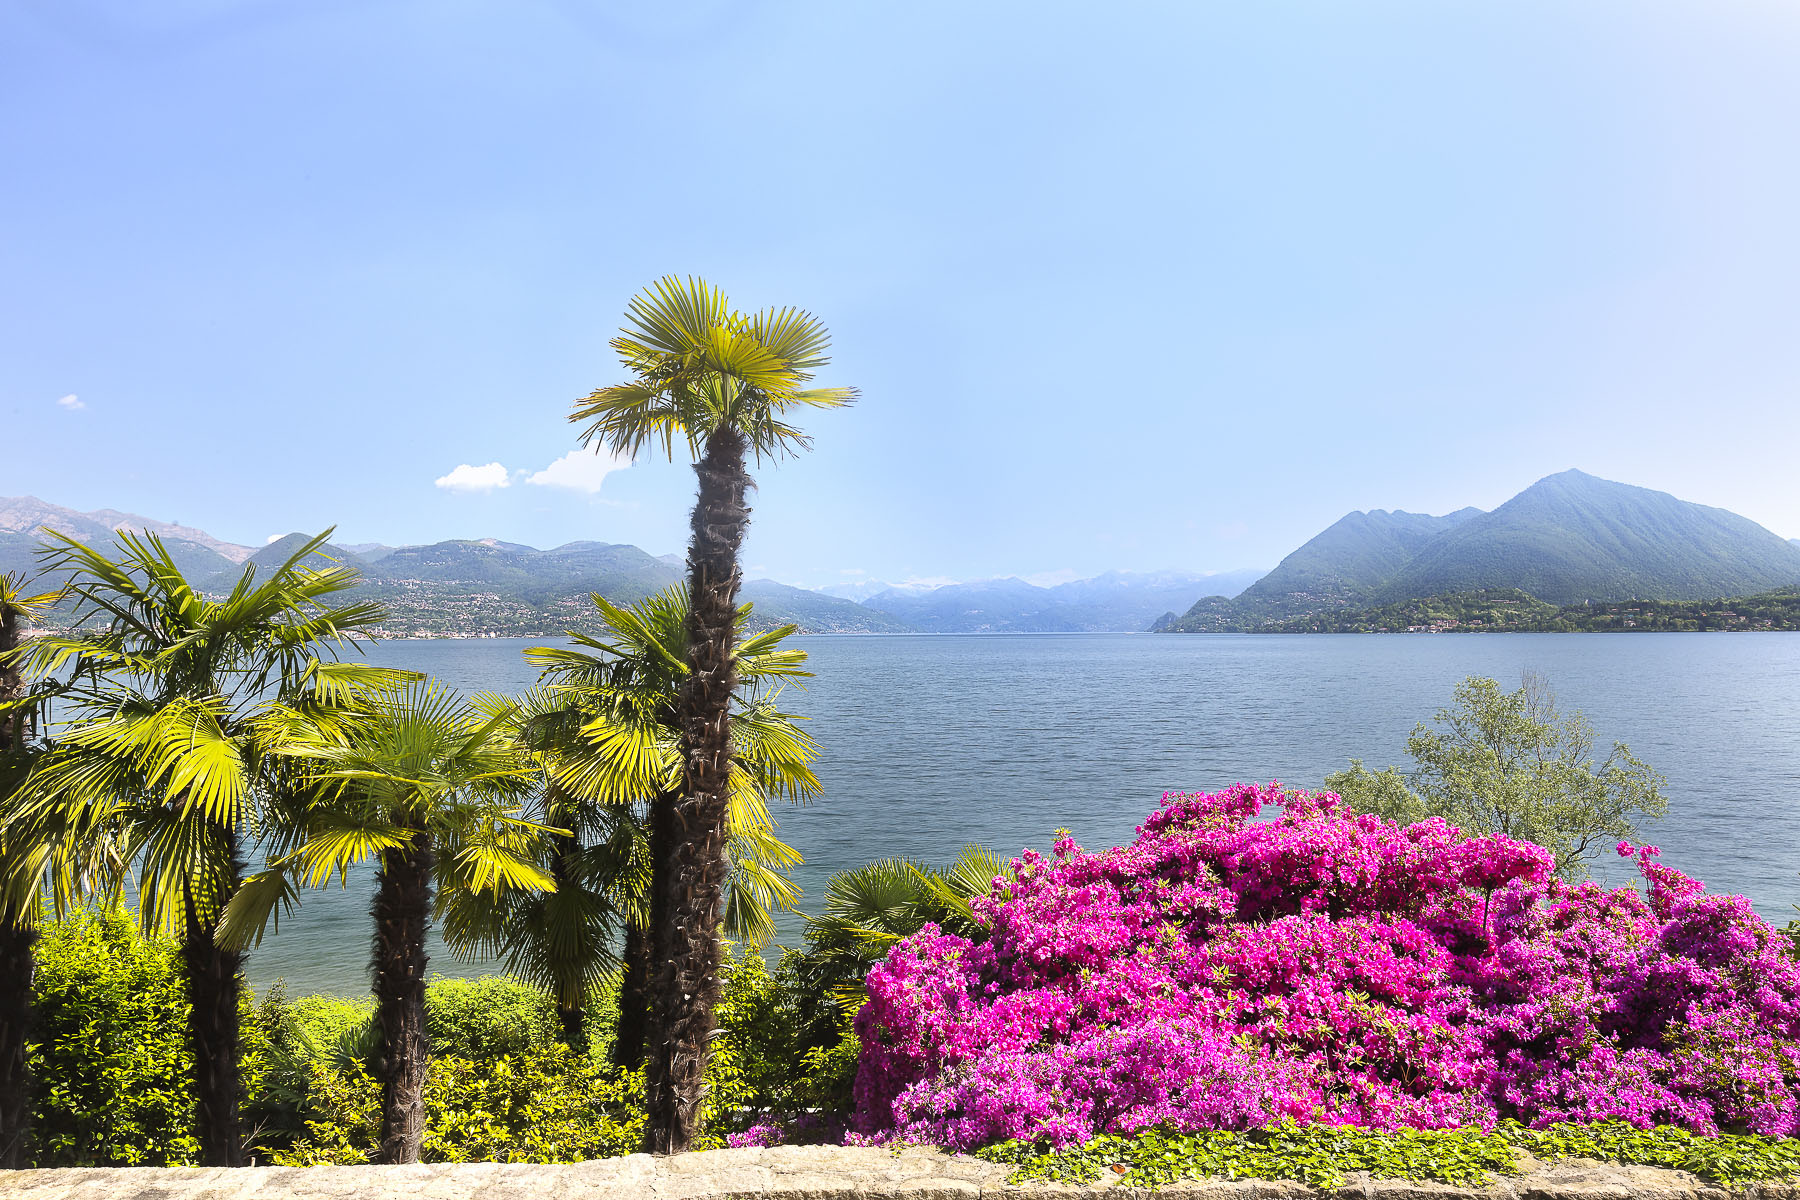 Villa in Vendita a Stresa: 5 locali, 1440 mq - Foto 4